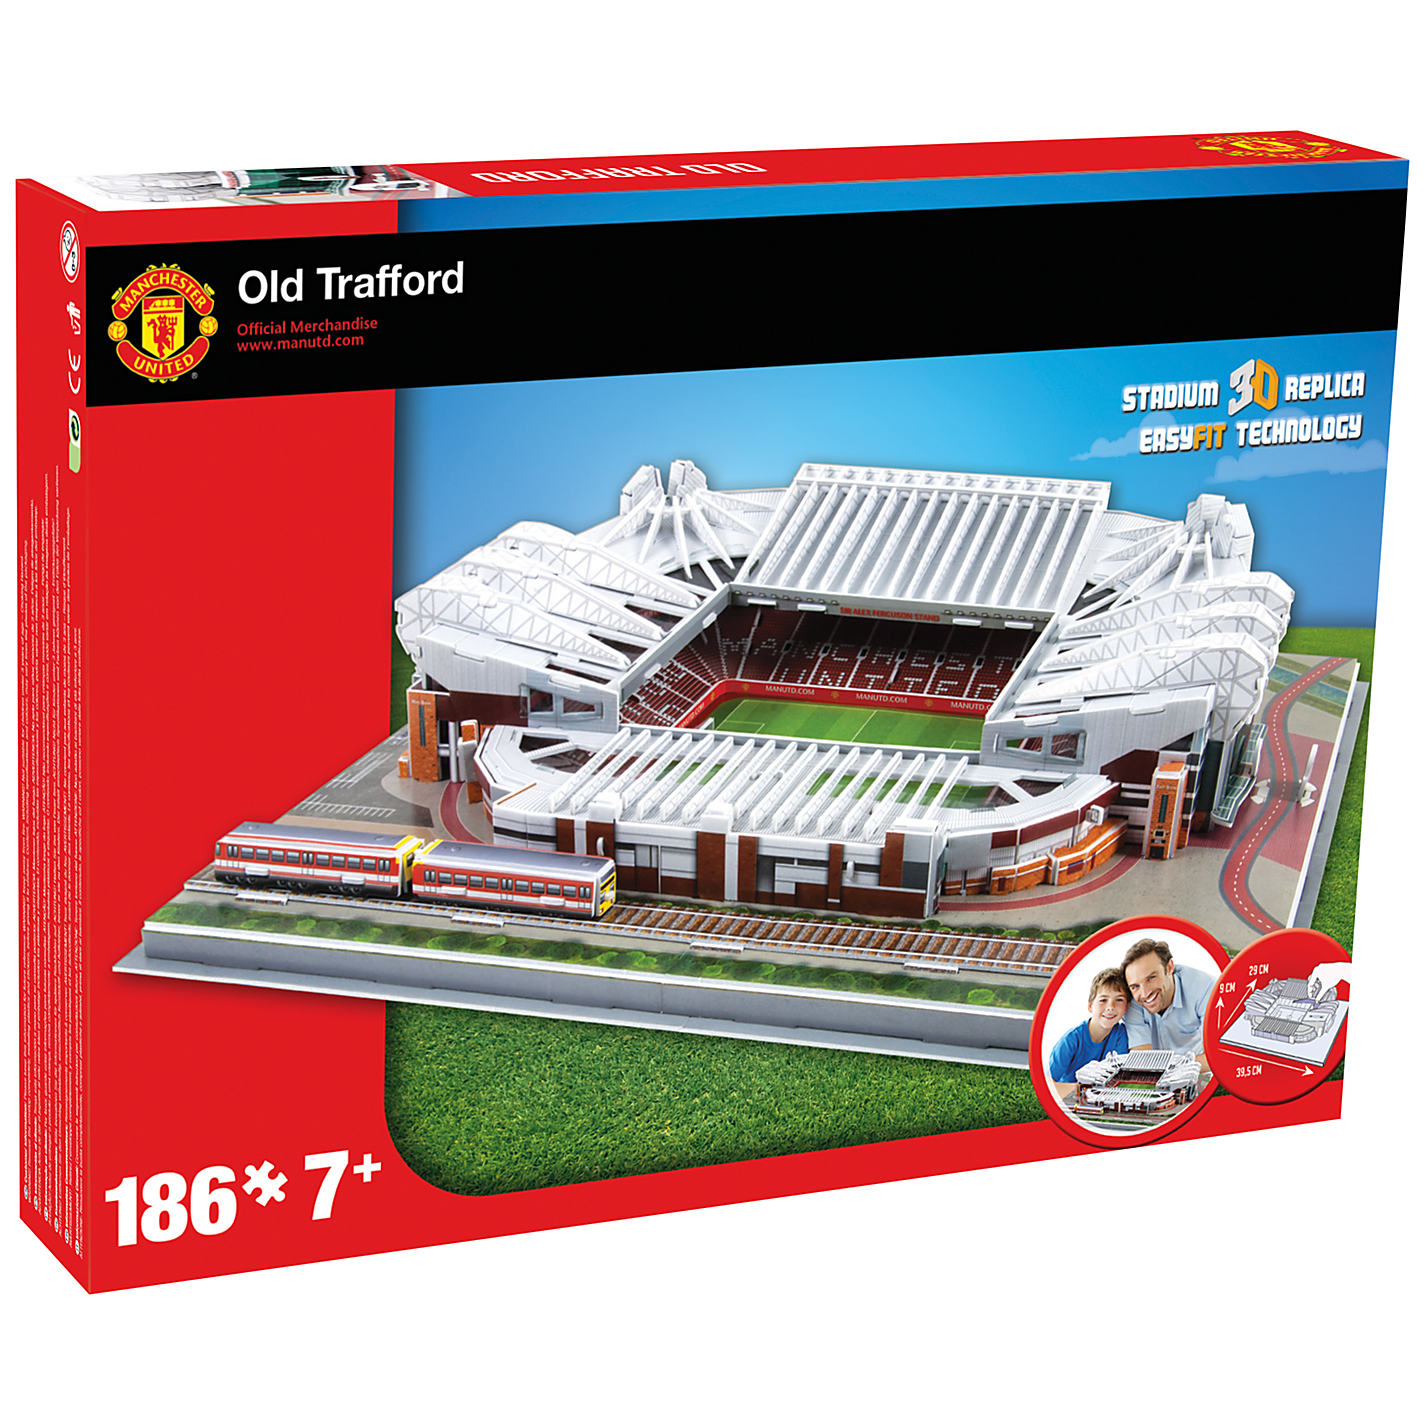 Puzzle Nanostad Estadio Old Trafford, Manchester 3D 186 Piezas